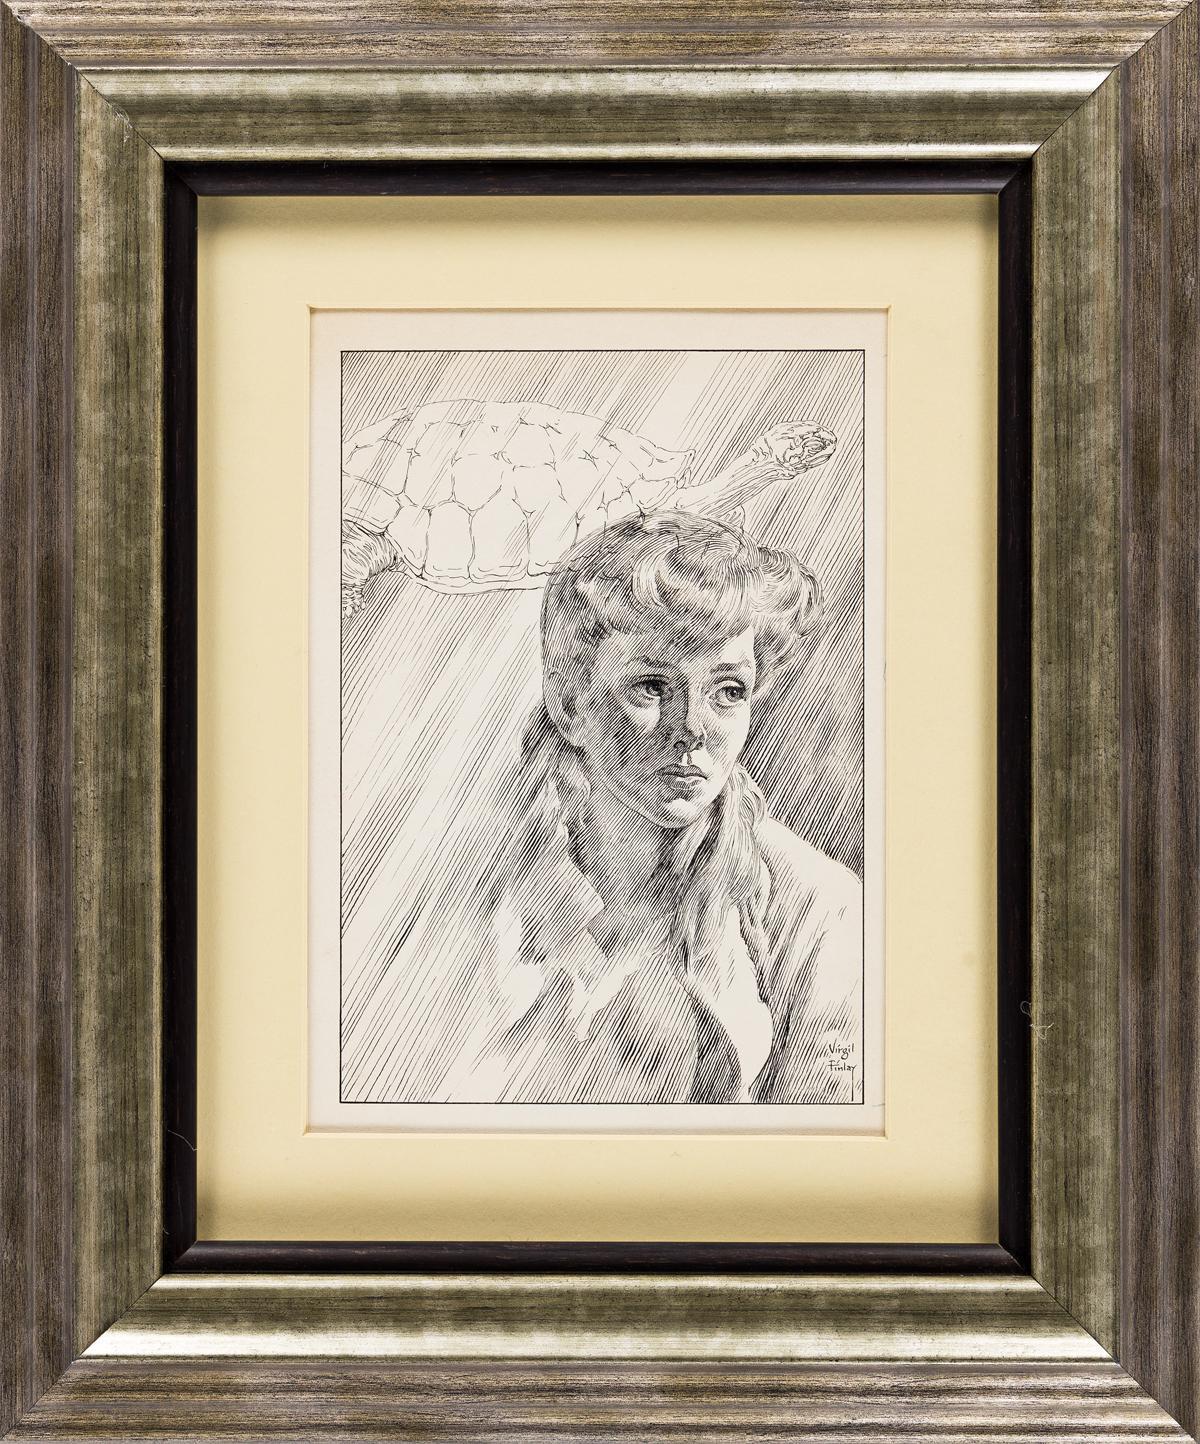 VIRGIL FINLAY ORIGINAL ARTWORK